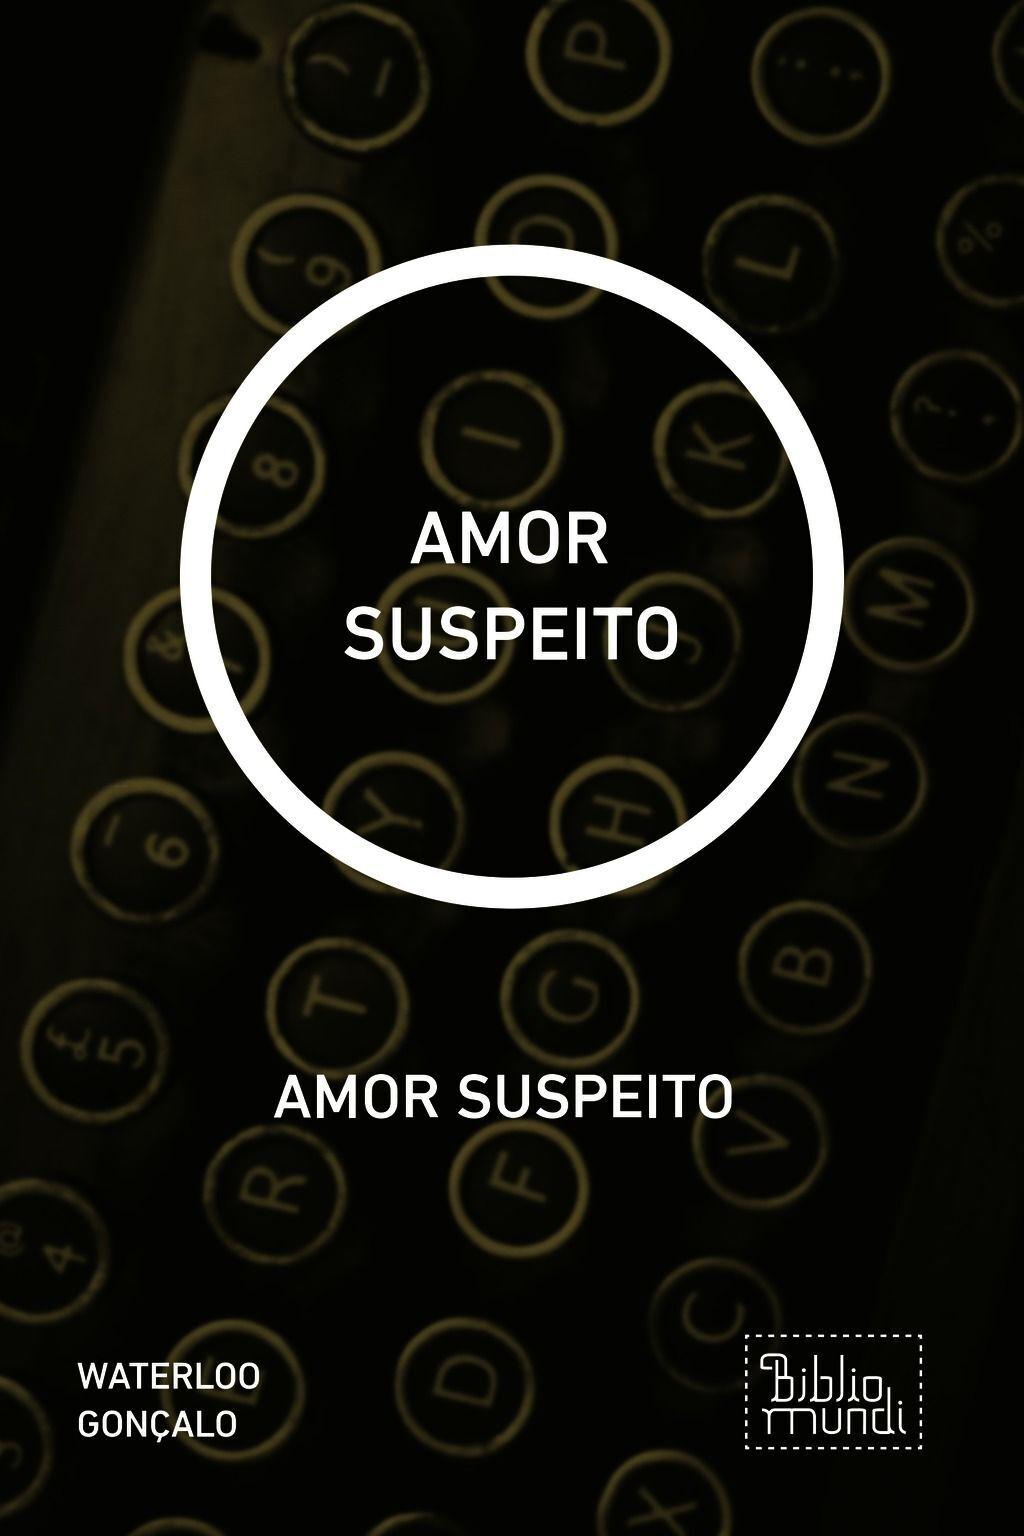 Amor Suspeito